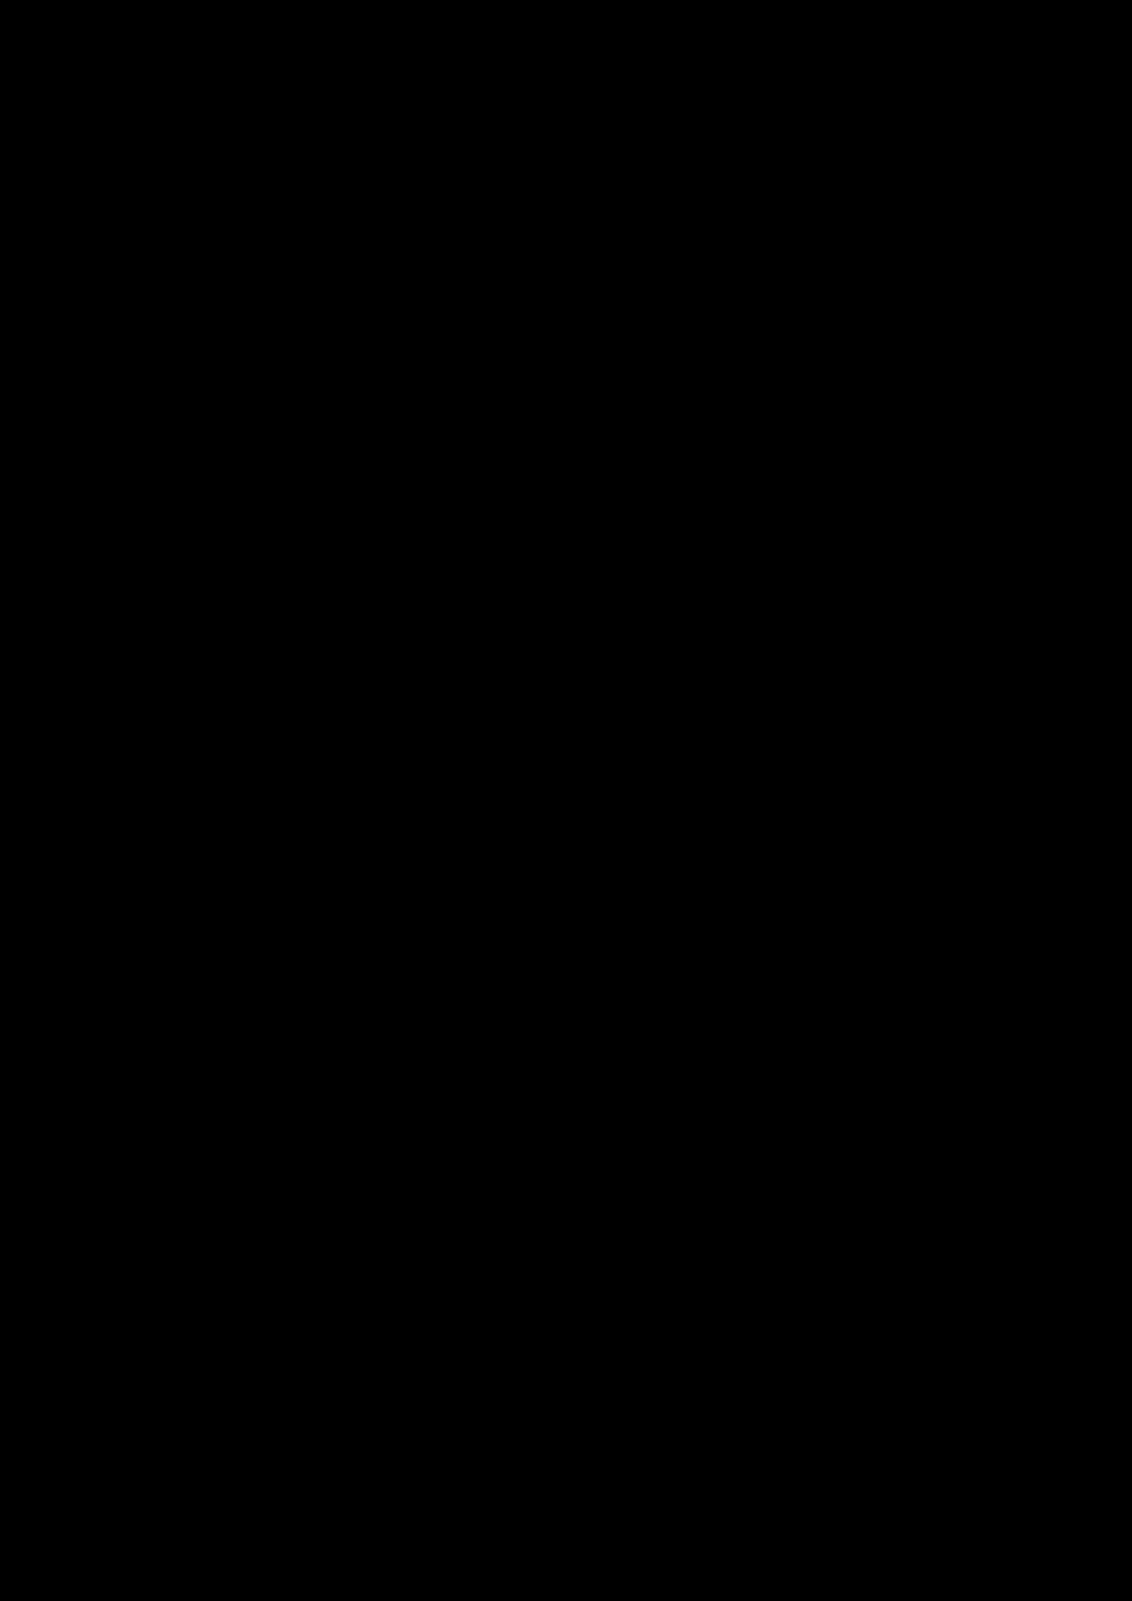 Ispoved Pervogo Boga slide, Image 48